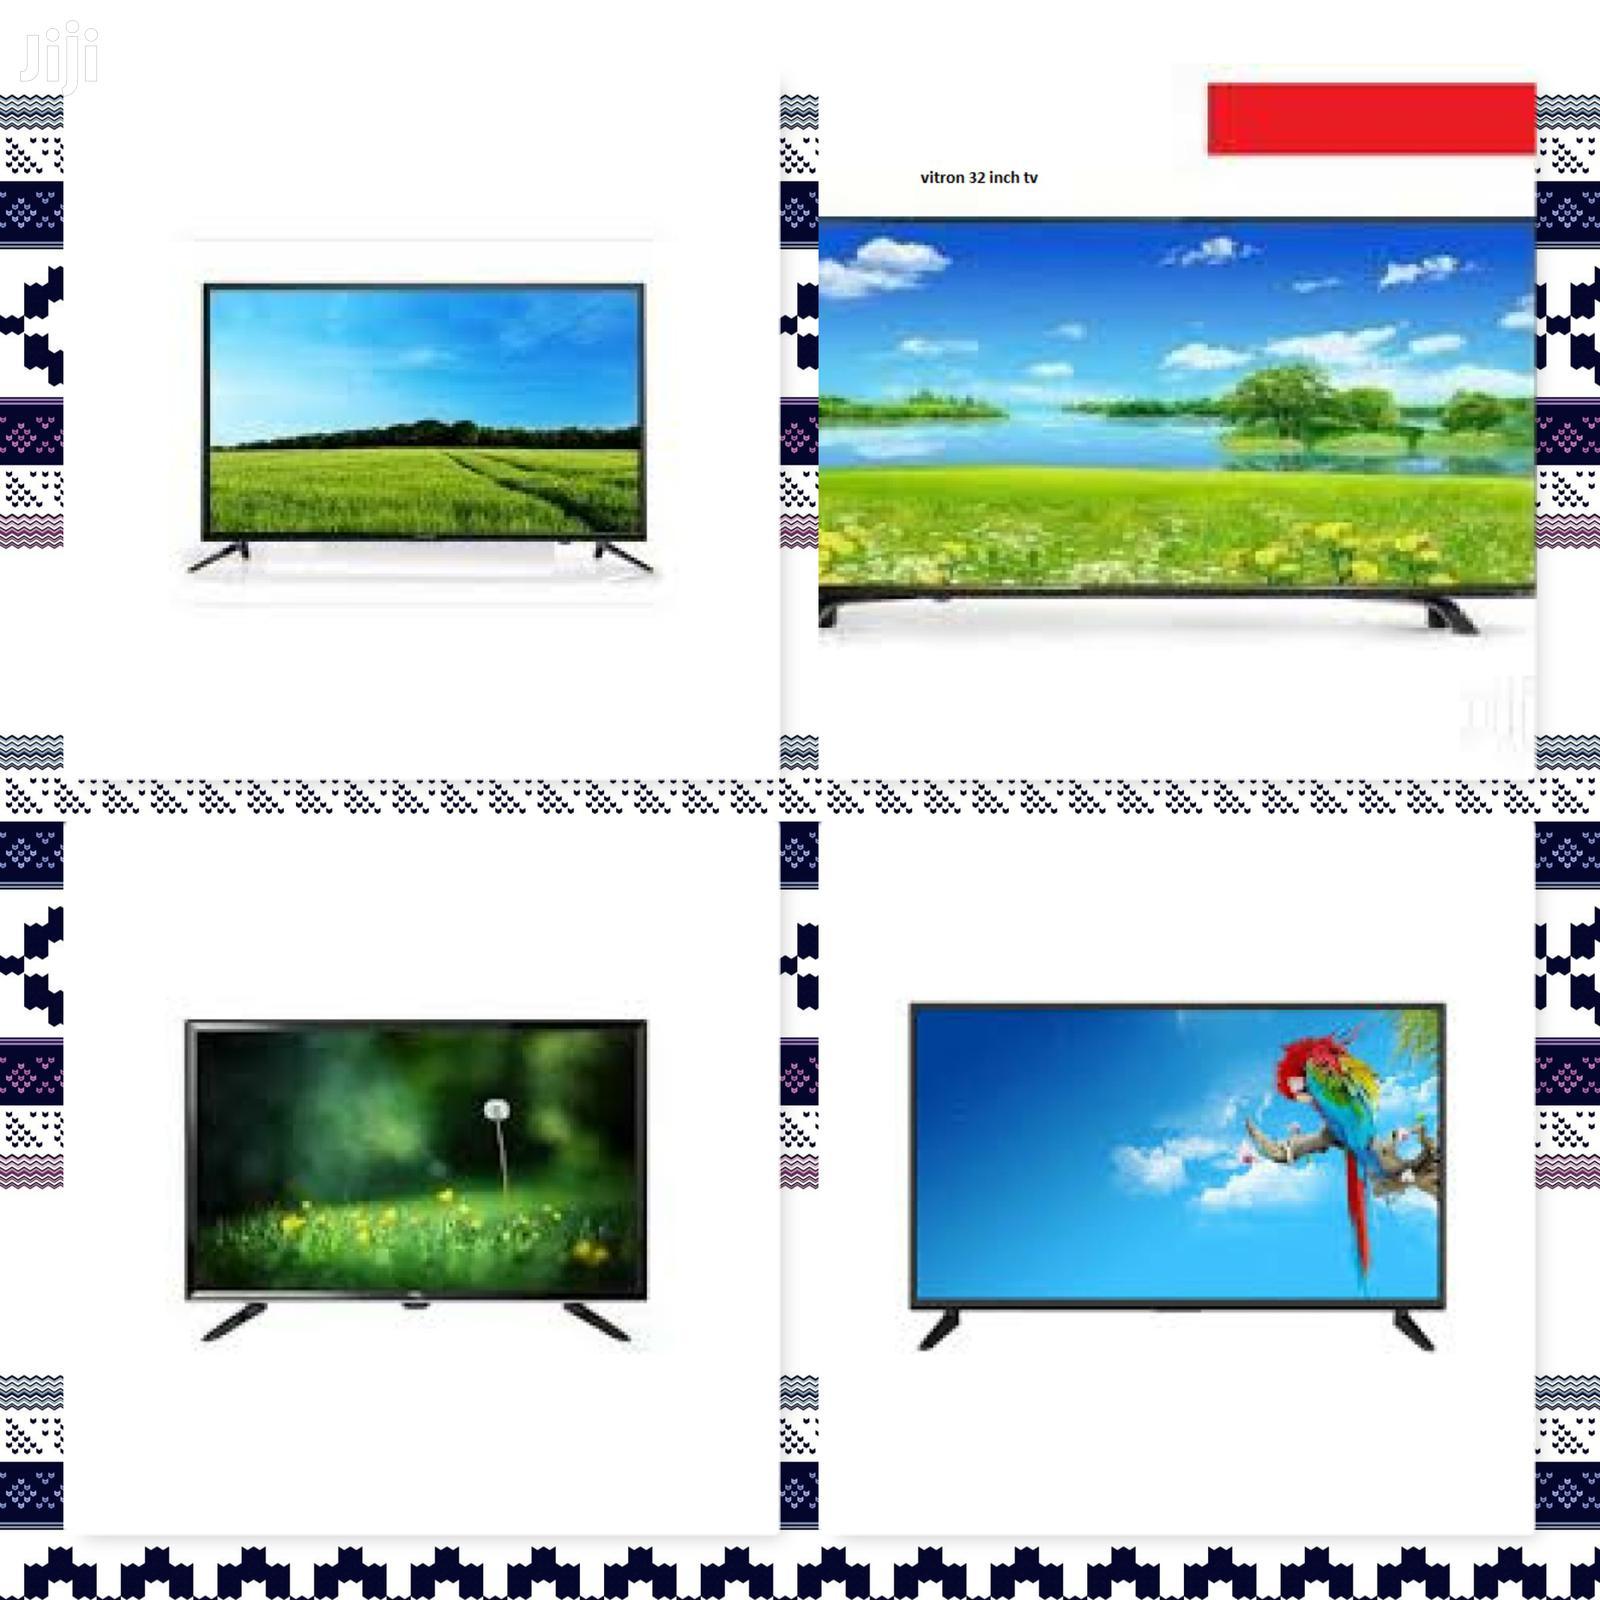 Vitron Digital LED TV 32 Inch